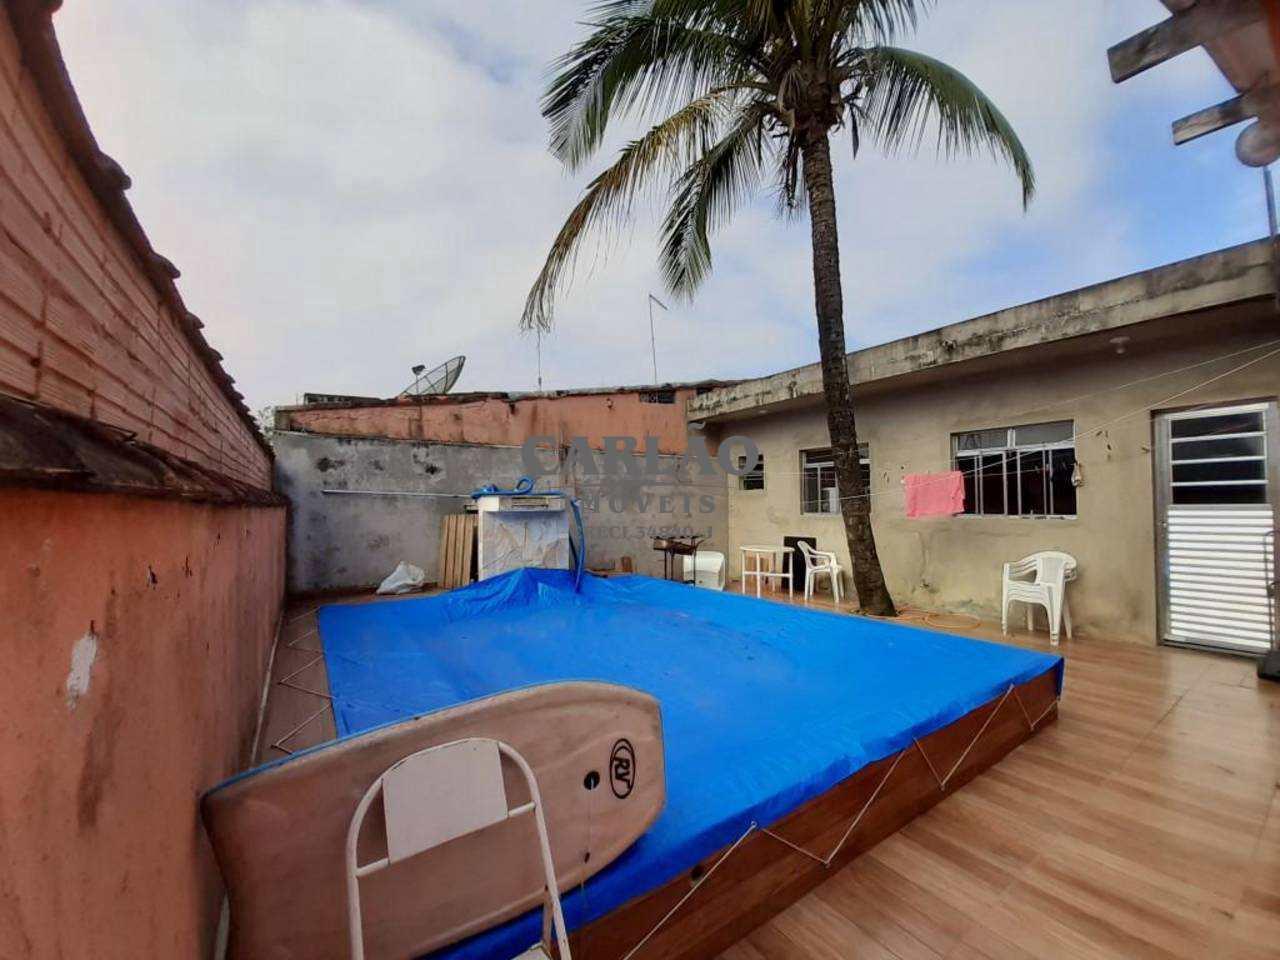 Casa com 3 dorms, Vila Loty, Itanhaém - R$ 280 mil, Cod: 352557